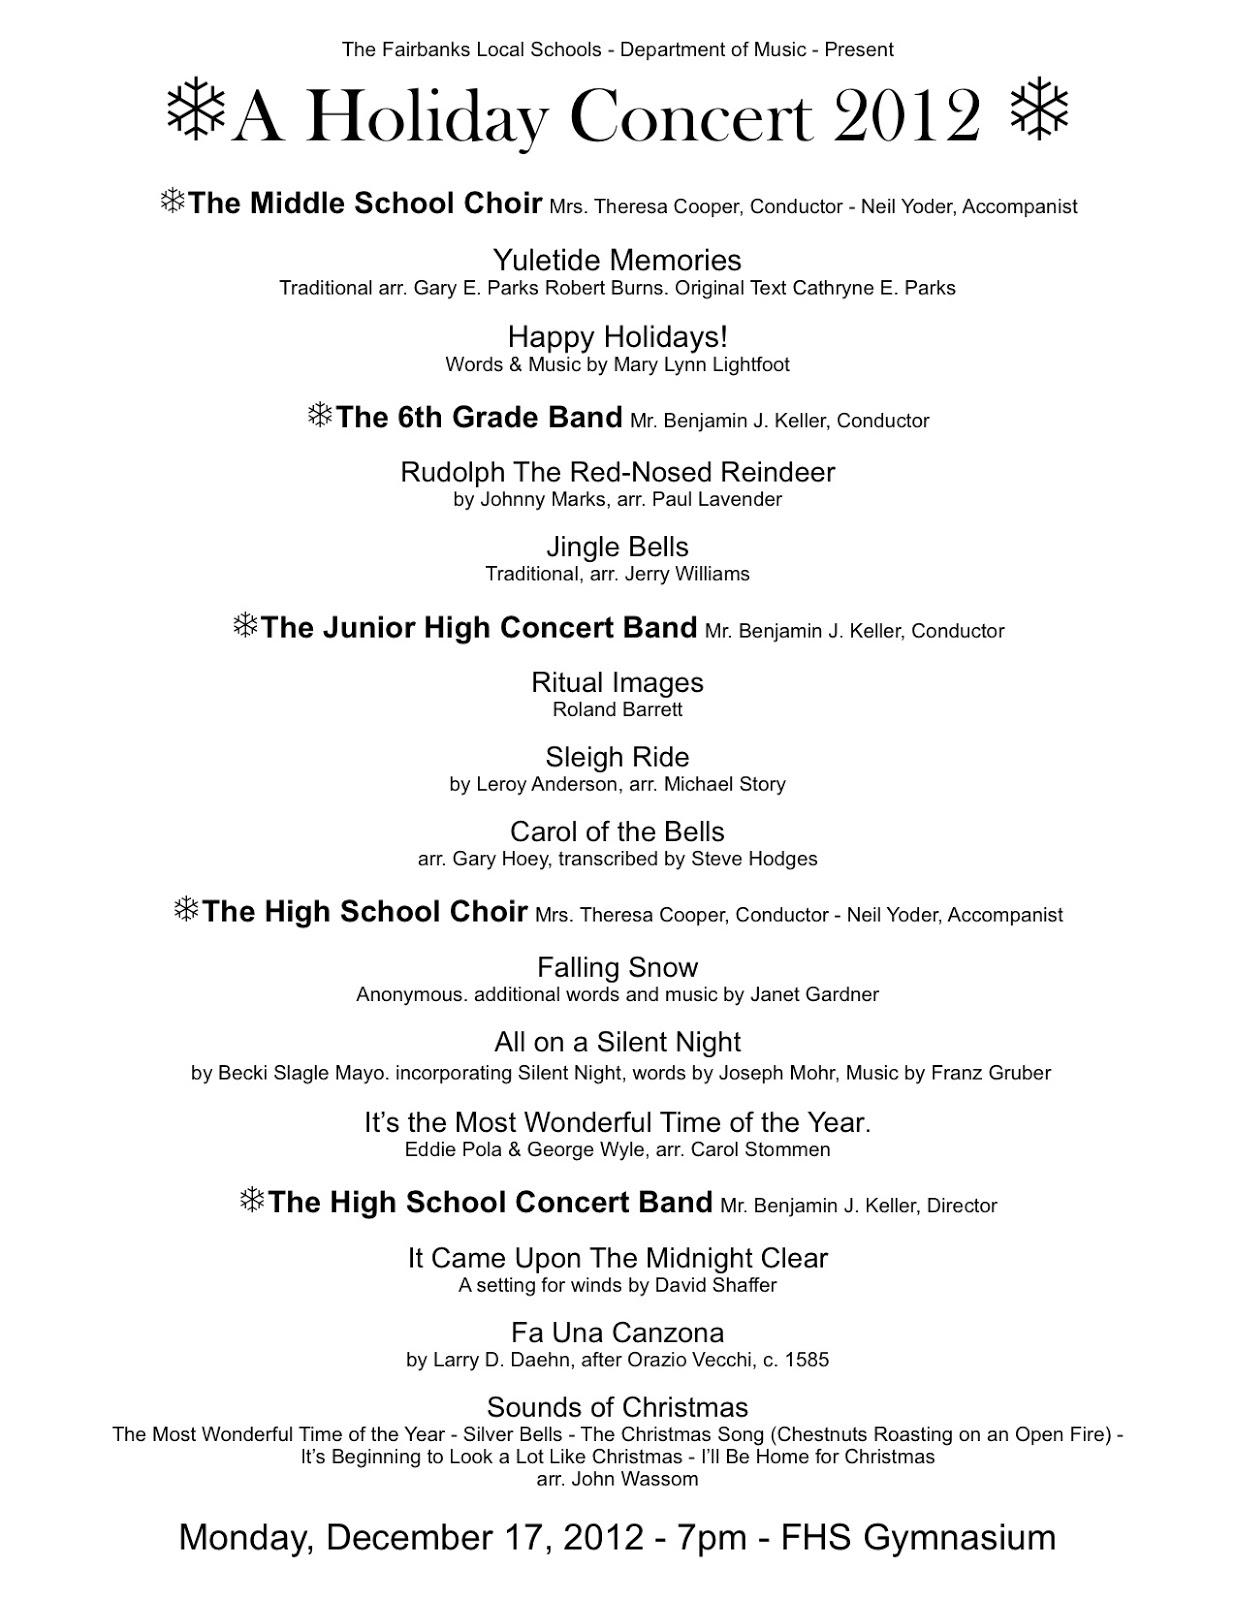 choral concert program template